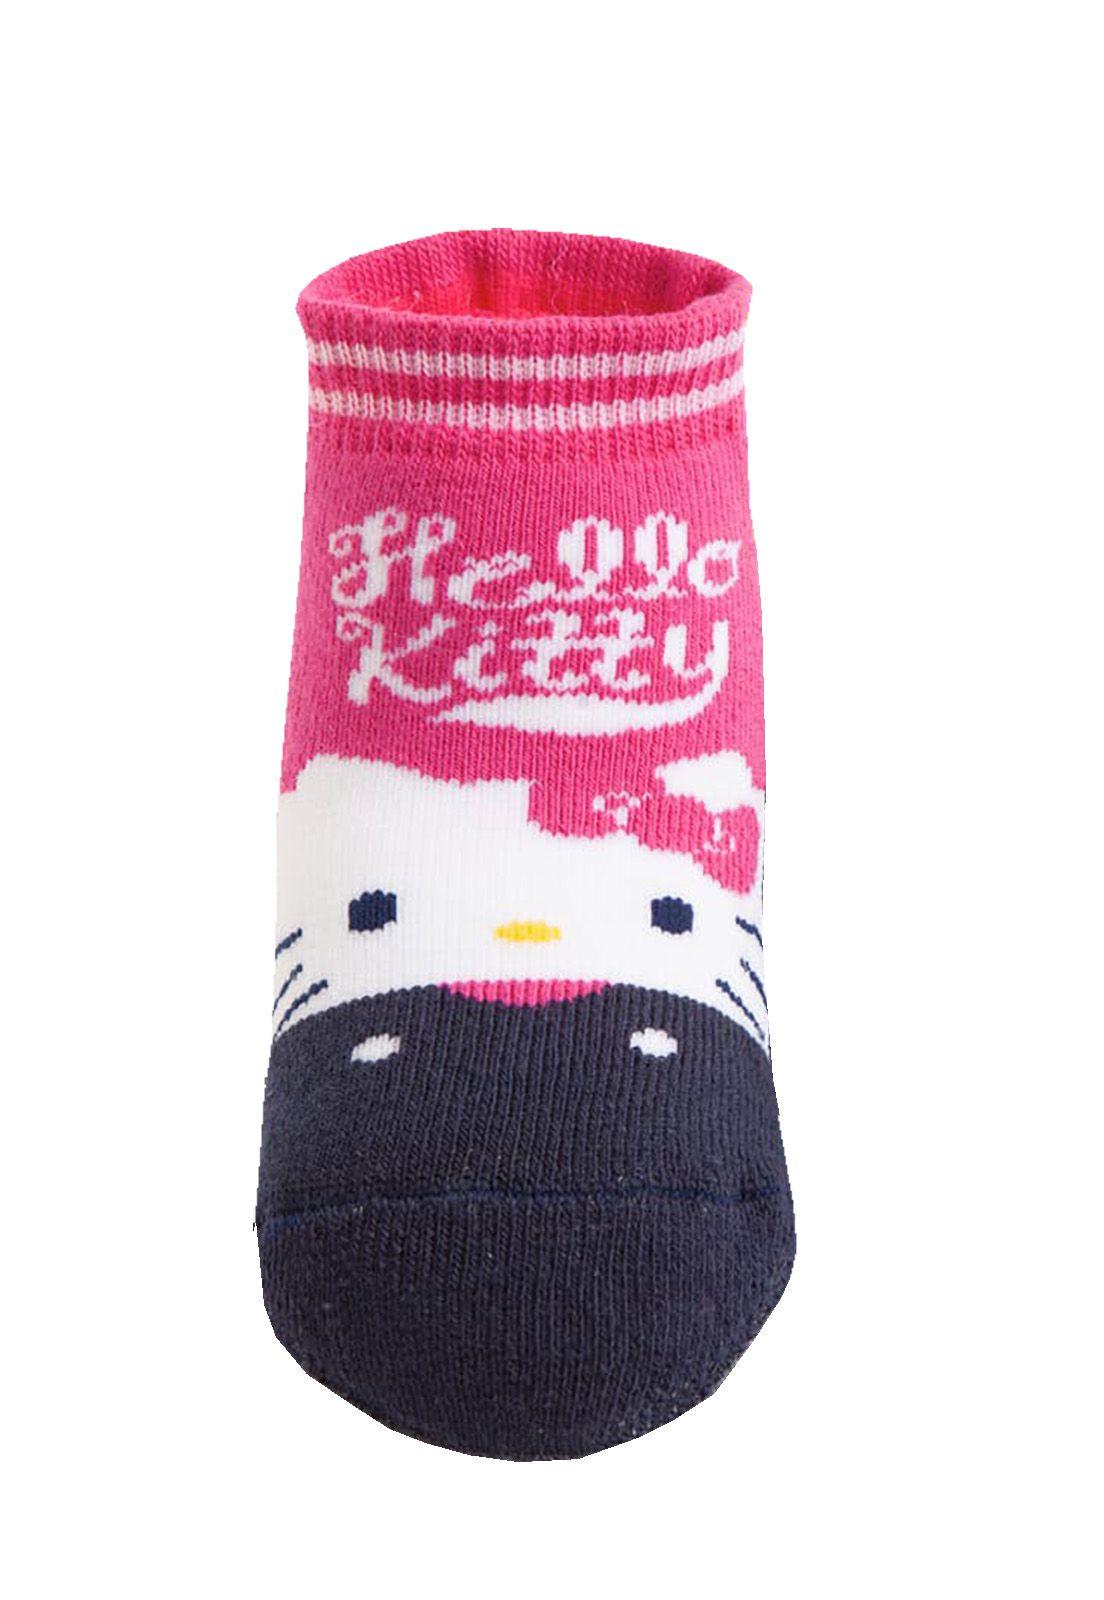 Meia Puket Pansocks Hello Kitty / Tamanho 19 a 22